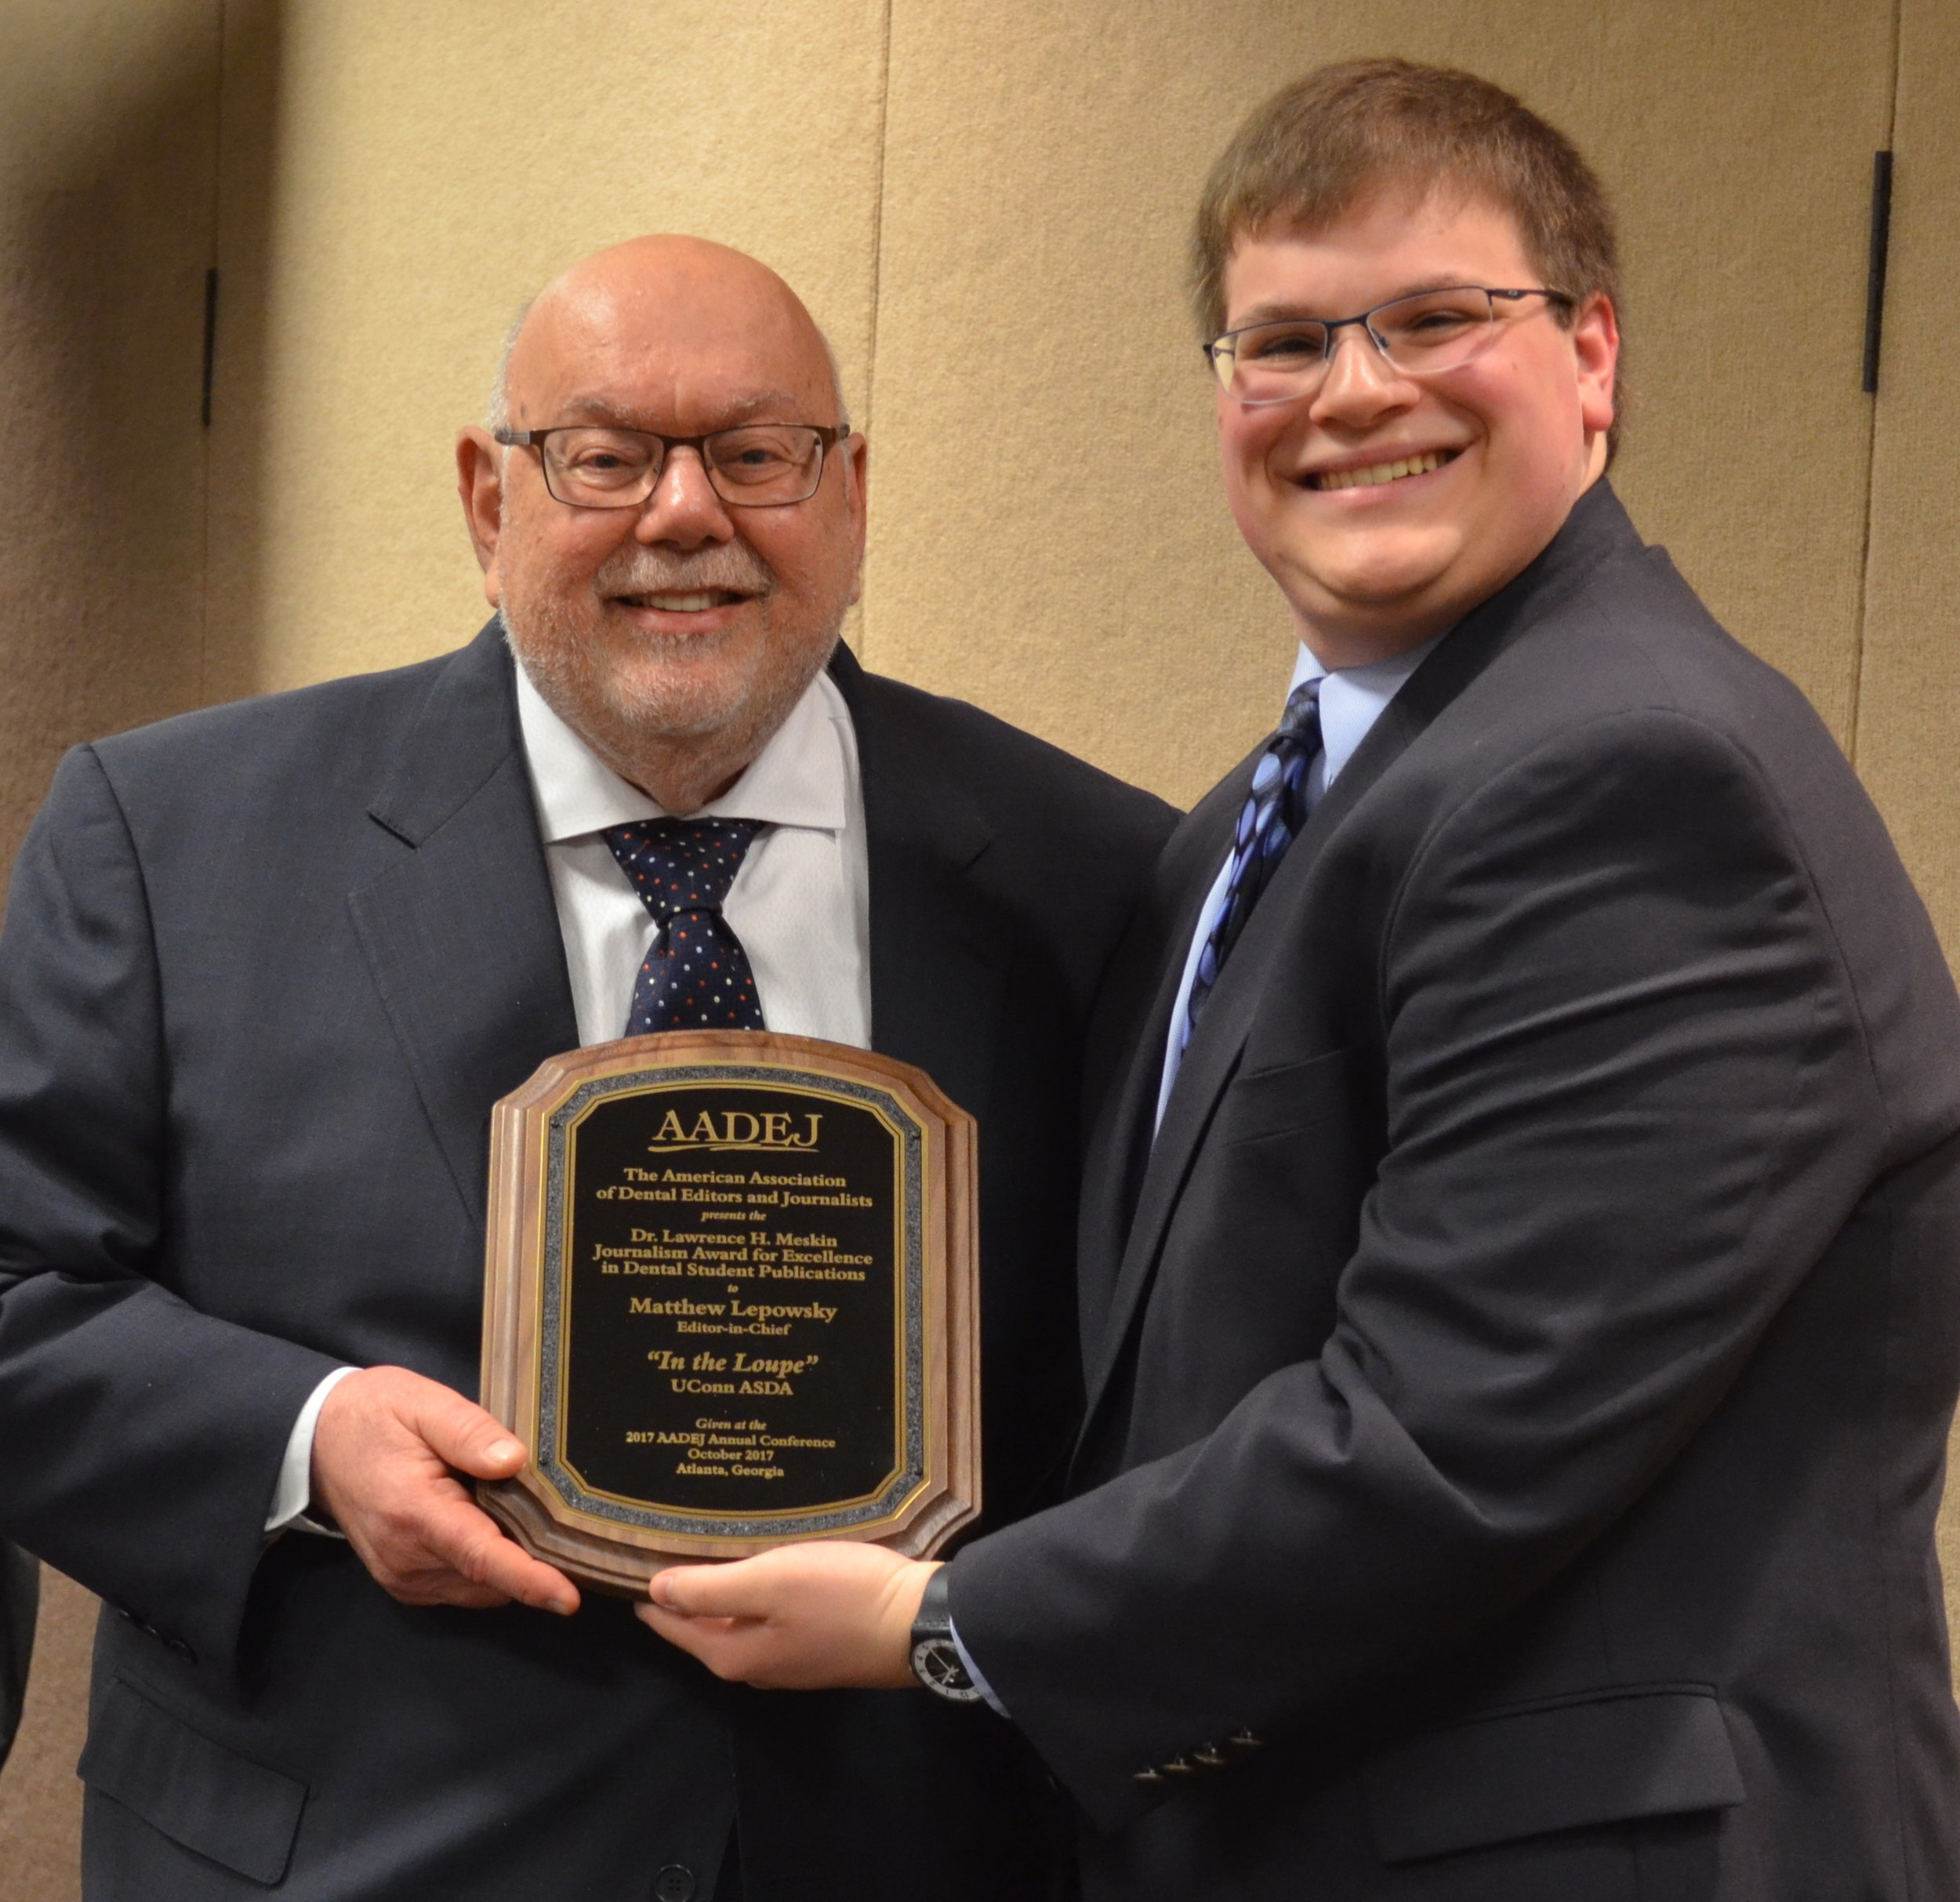 Matthew Lopowsky of UConn accepts the 2017 Meskin Journalism Award